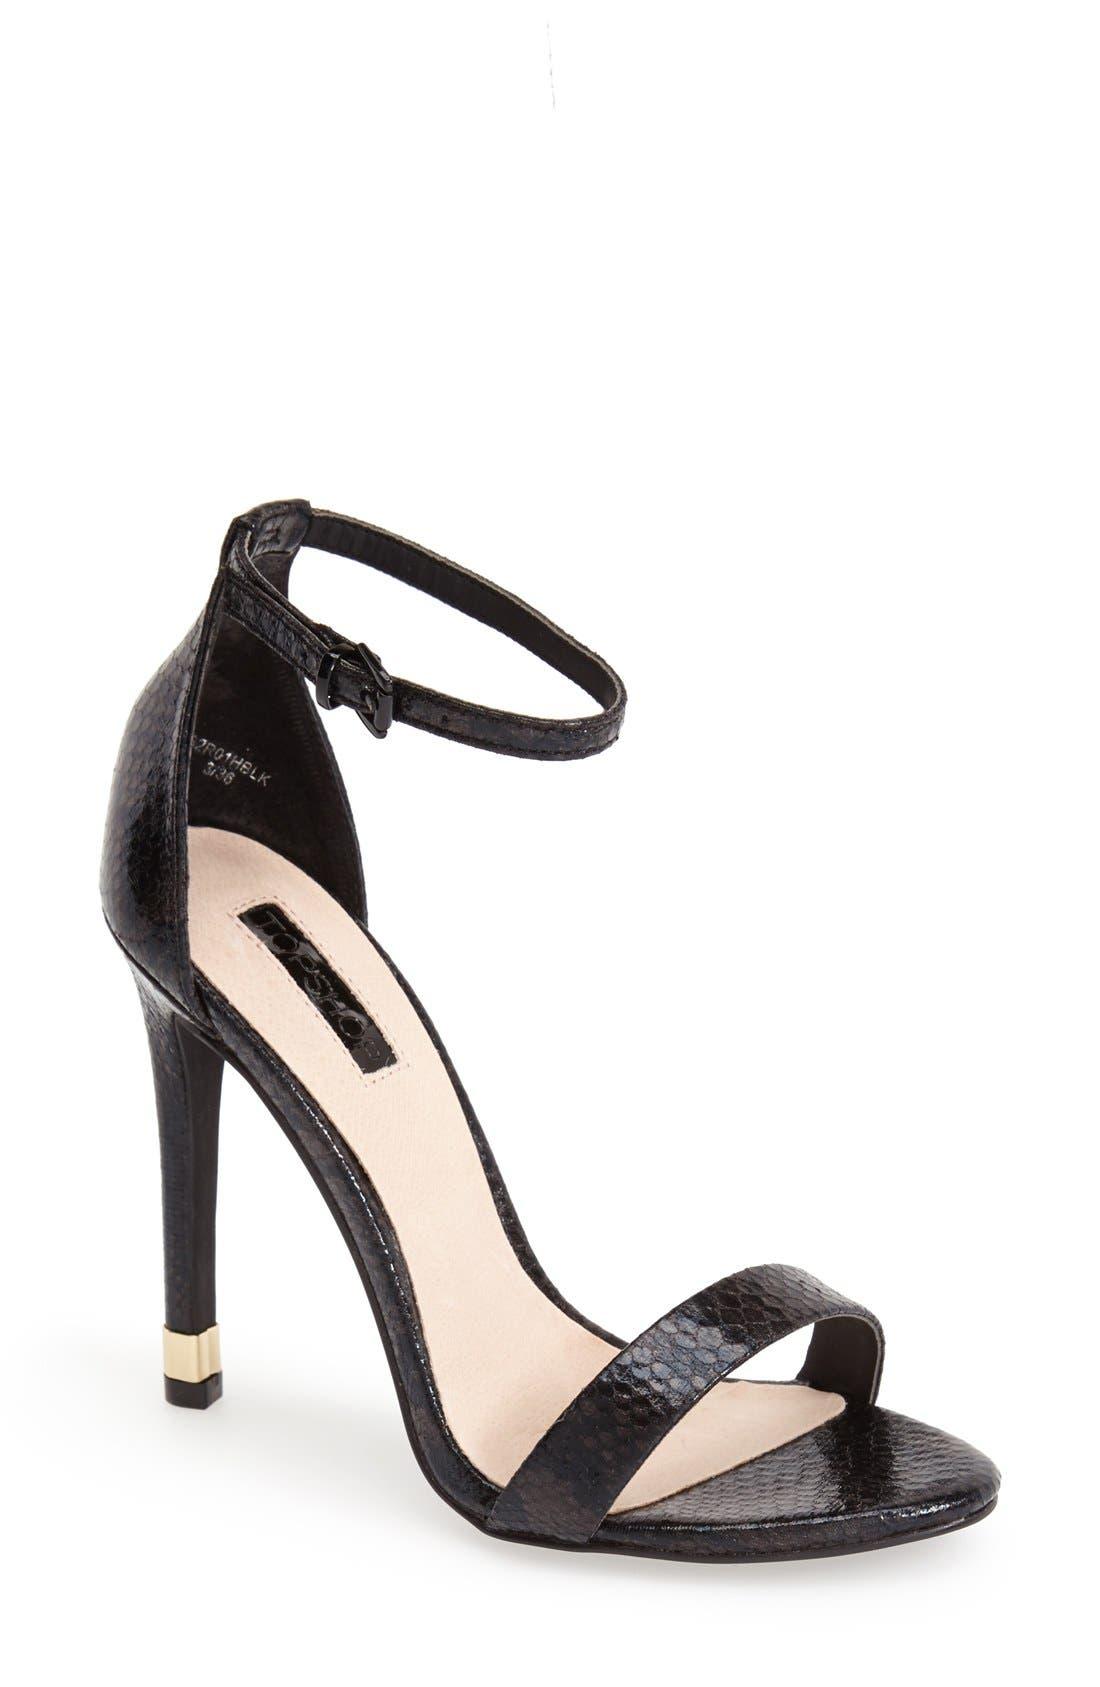 Alternate Image 1 Selected - Topshop 'Ruby' Snake Embossed Ankle Strap Sandal (Women)